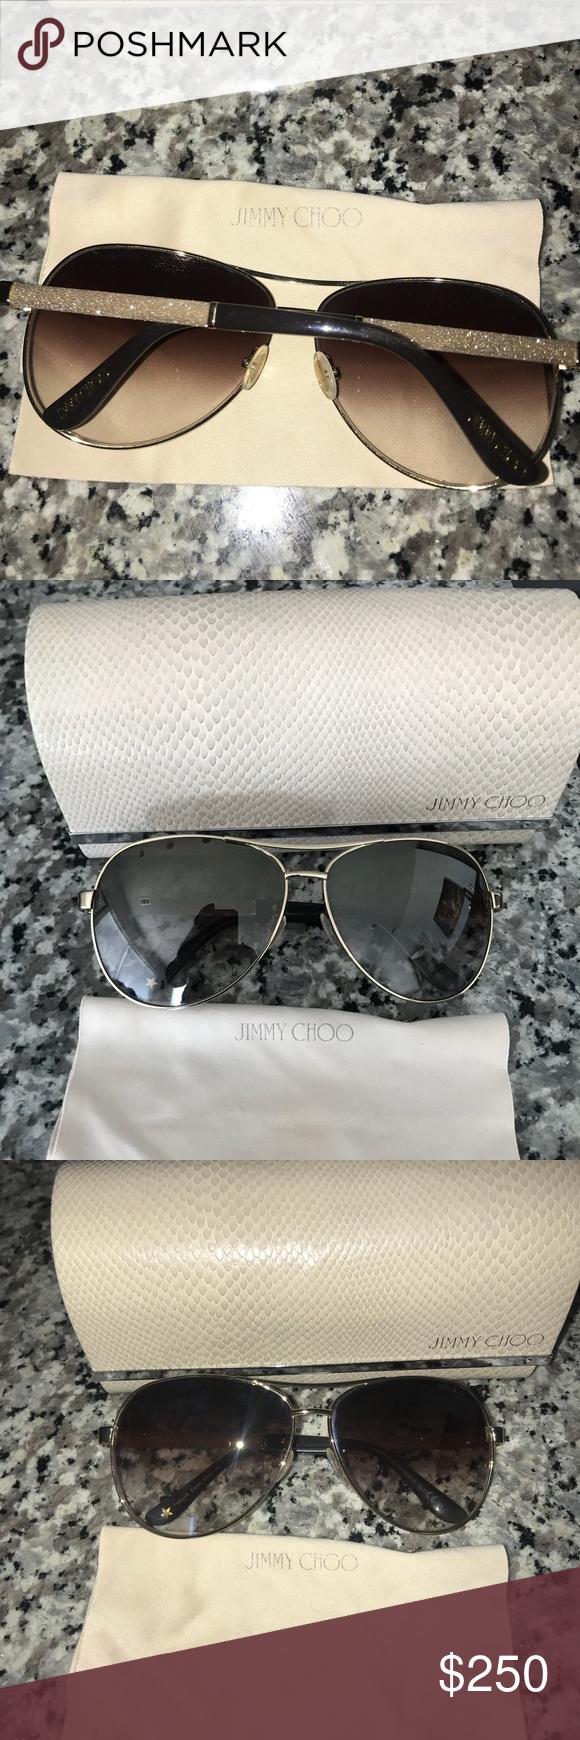 7881f7e026d Jummi choo sunglasses Women s Lexie Jimmy Choo Other